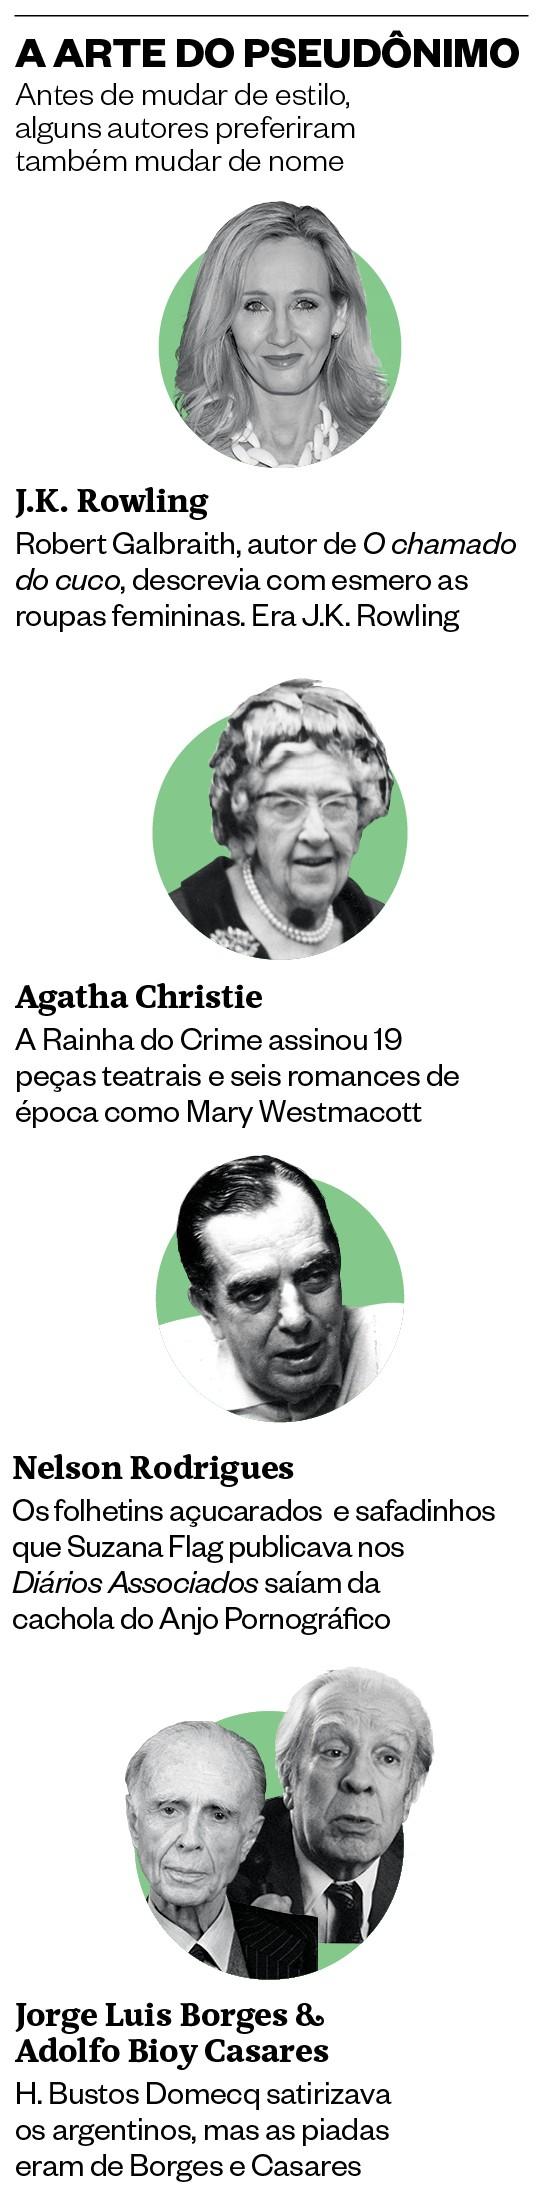 Nomes de alguns autores que preferiram também mudar de nome (Foto: AFP, Getty Images, AP (2) e D.A. Press)